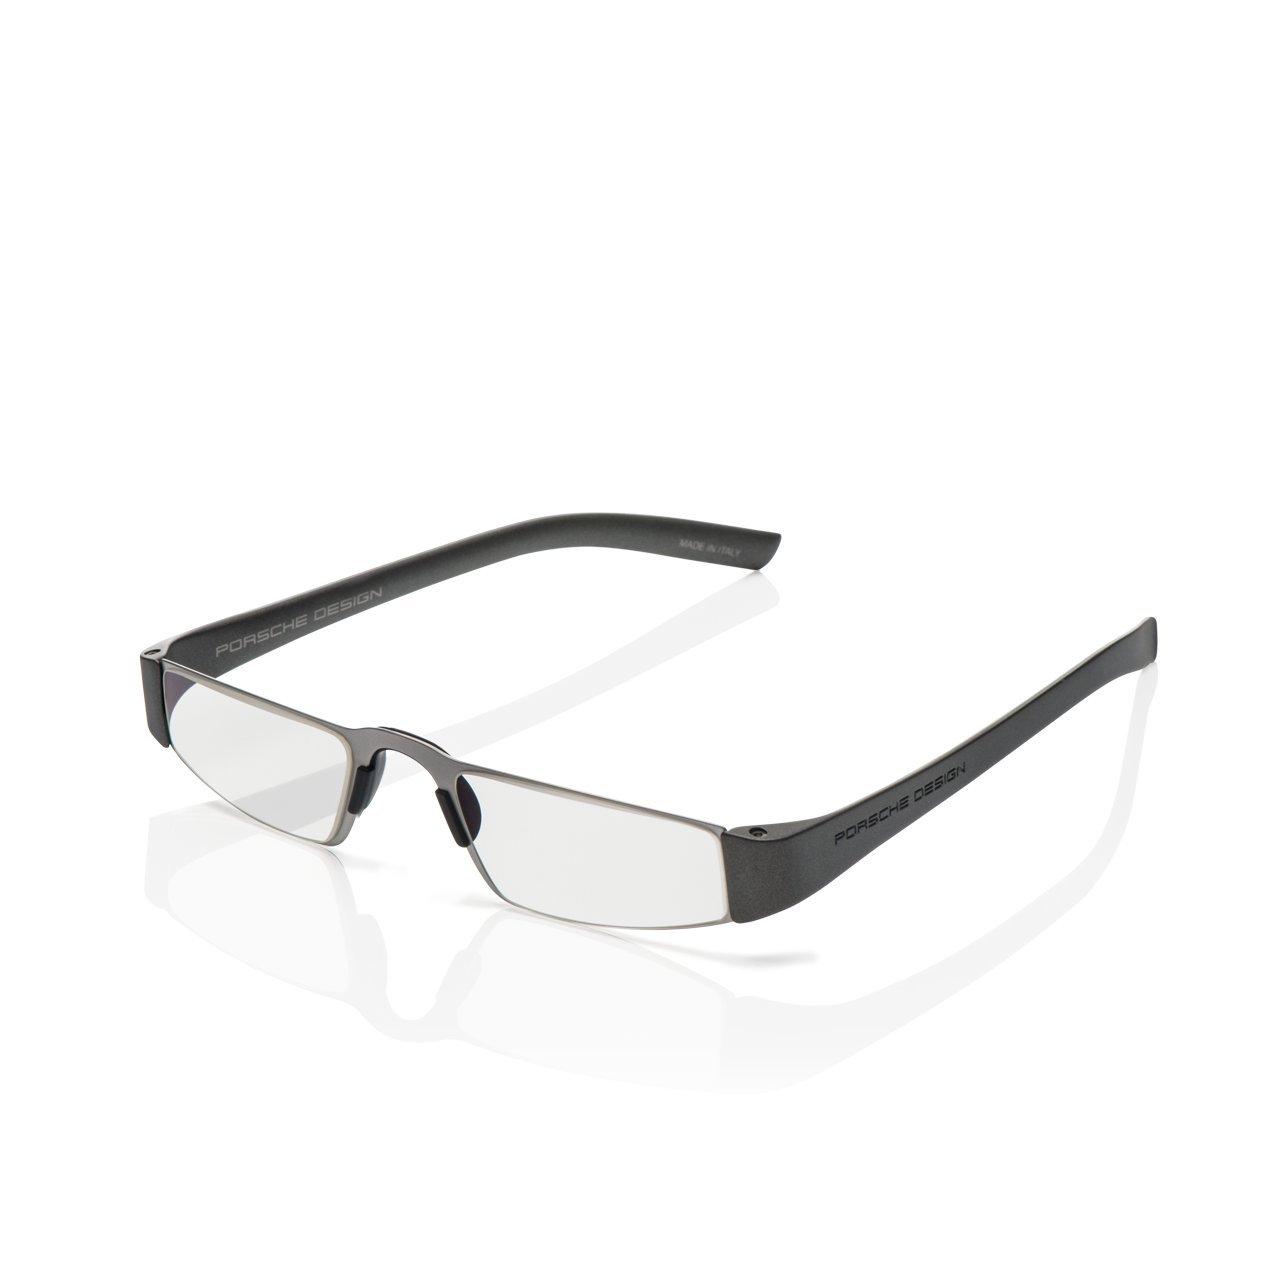 Porsche Design P8801 Eyeglasses 8801 F Men Frame Gun Metal, Silver 48mm,Power +2.50